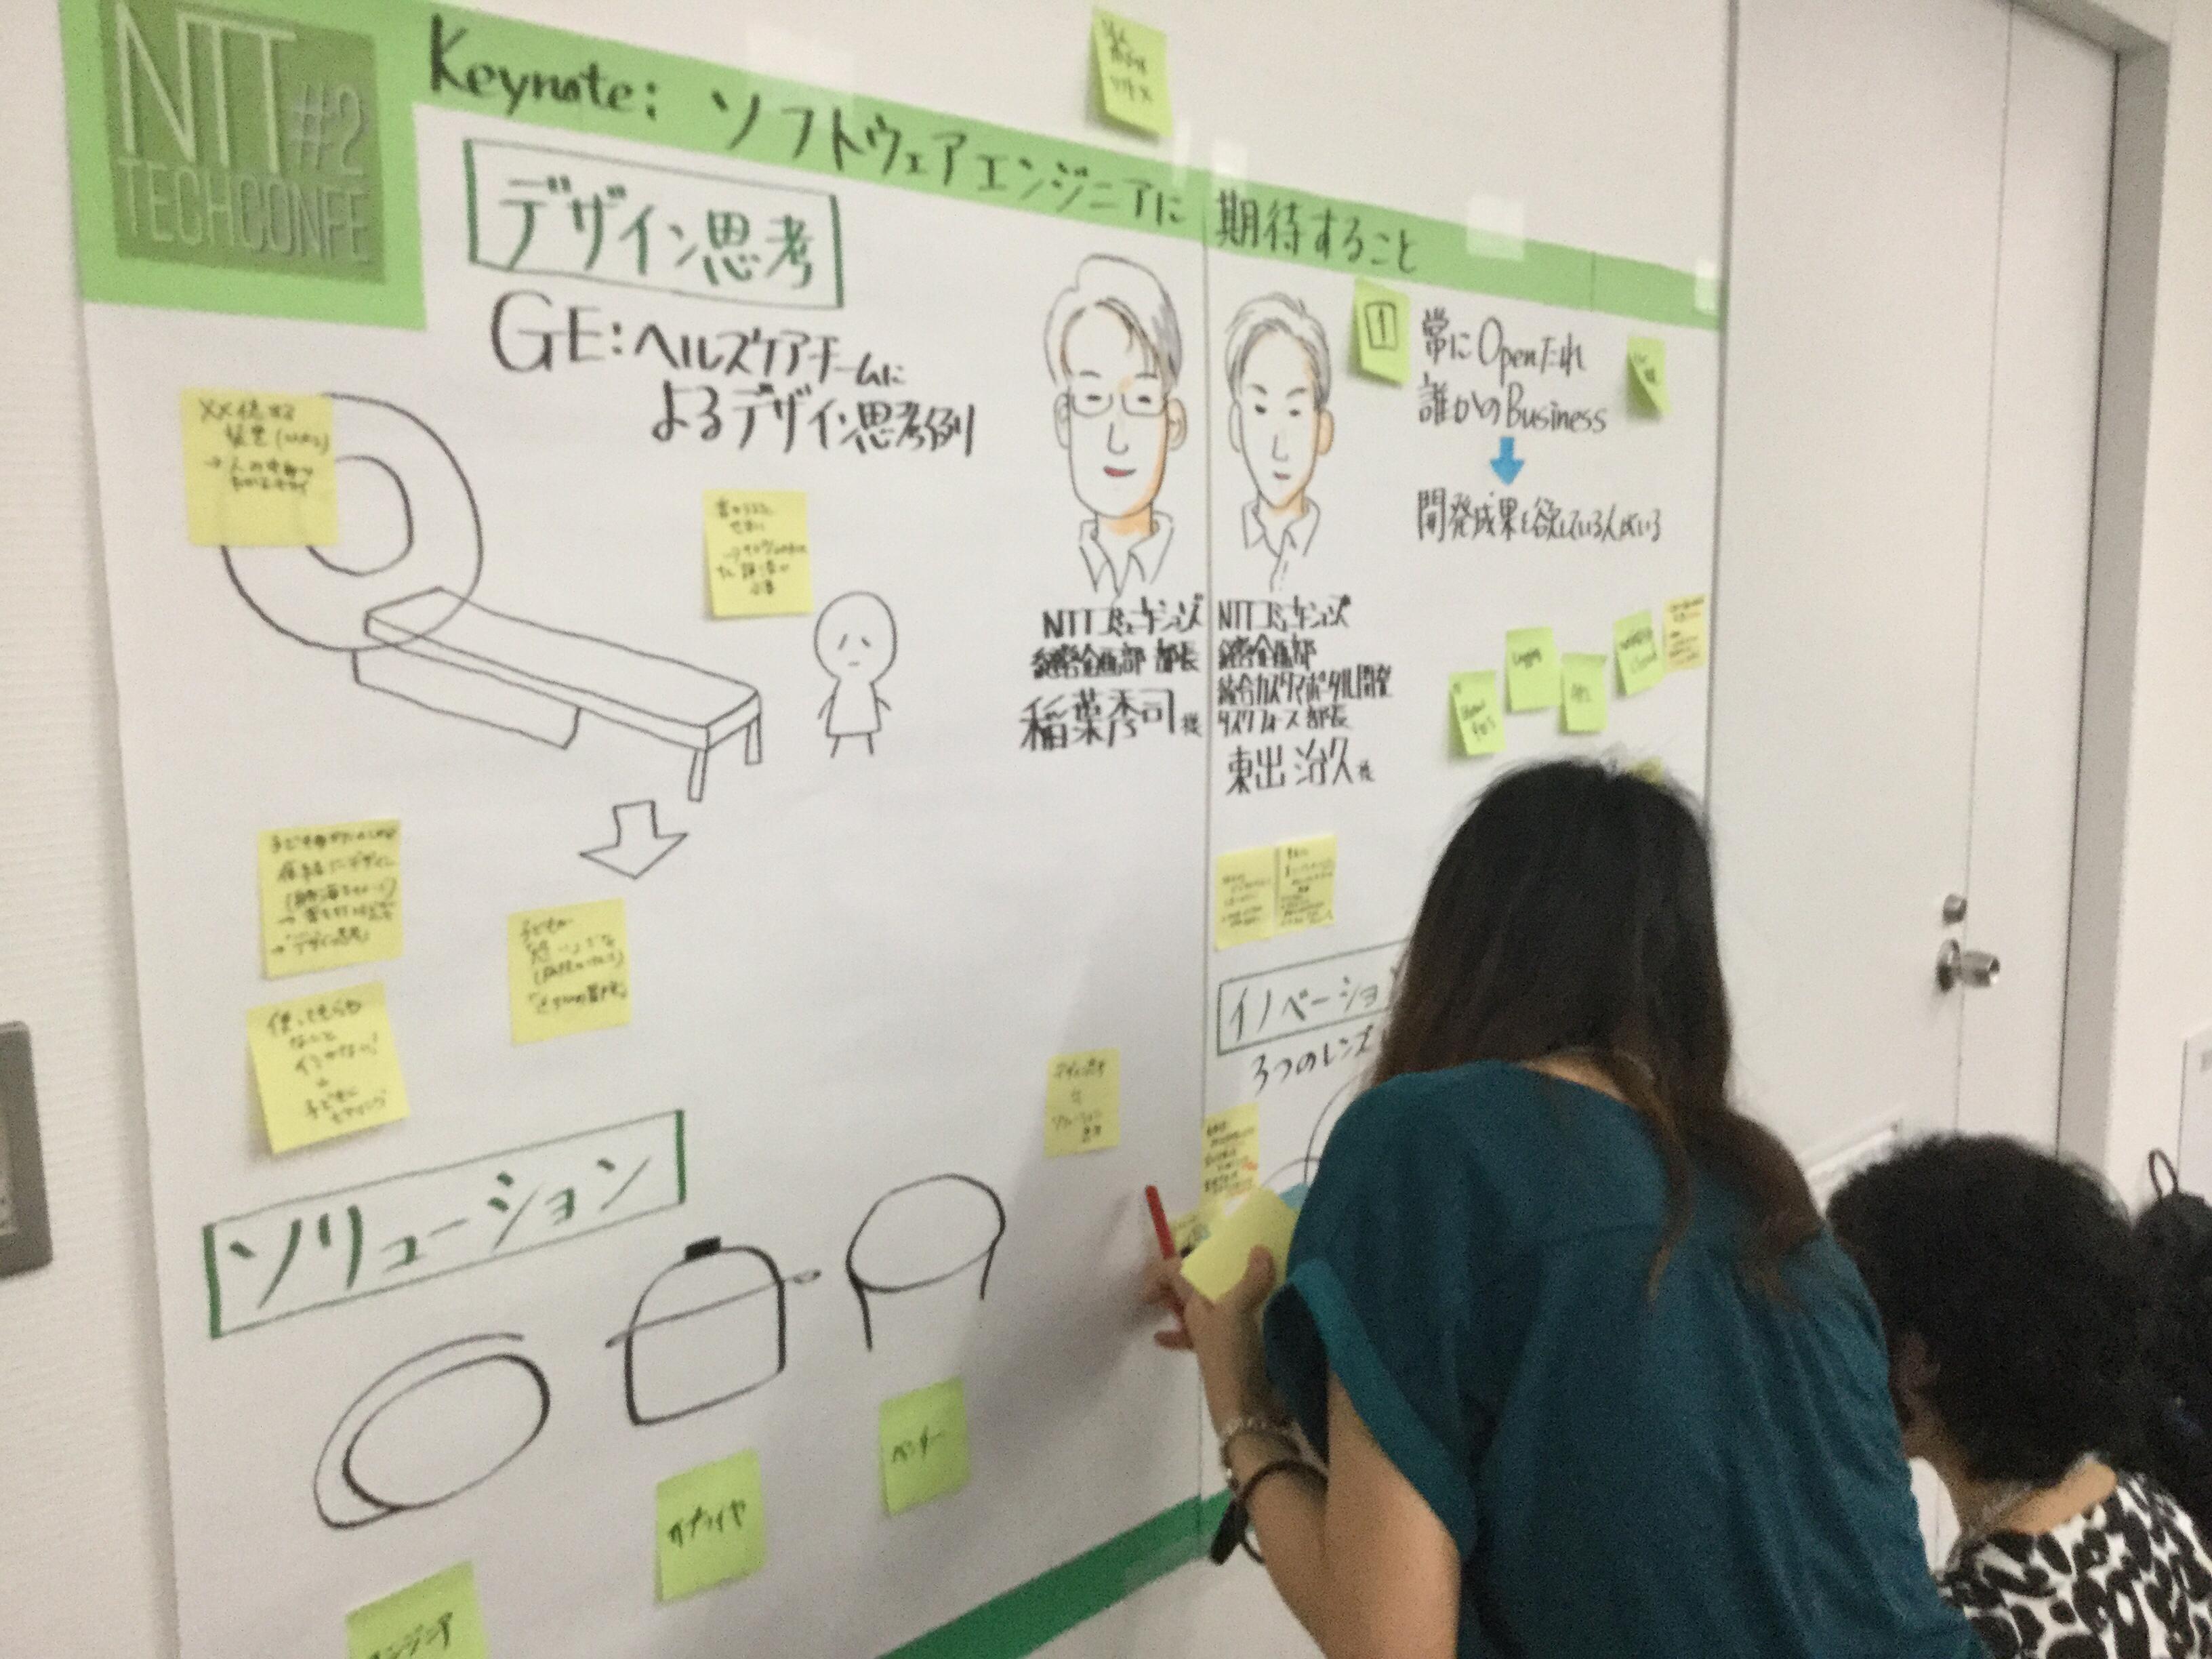 Opening Keynoteに弊社の経営企画部長にデザイン思考やUI/UXの話をグラフィックレコーディングしてる最中